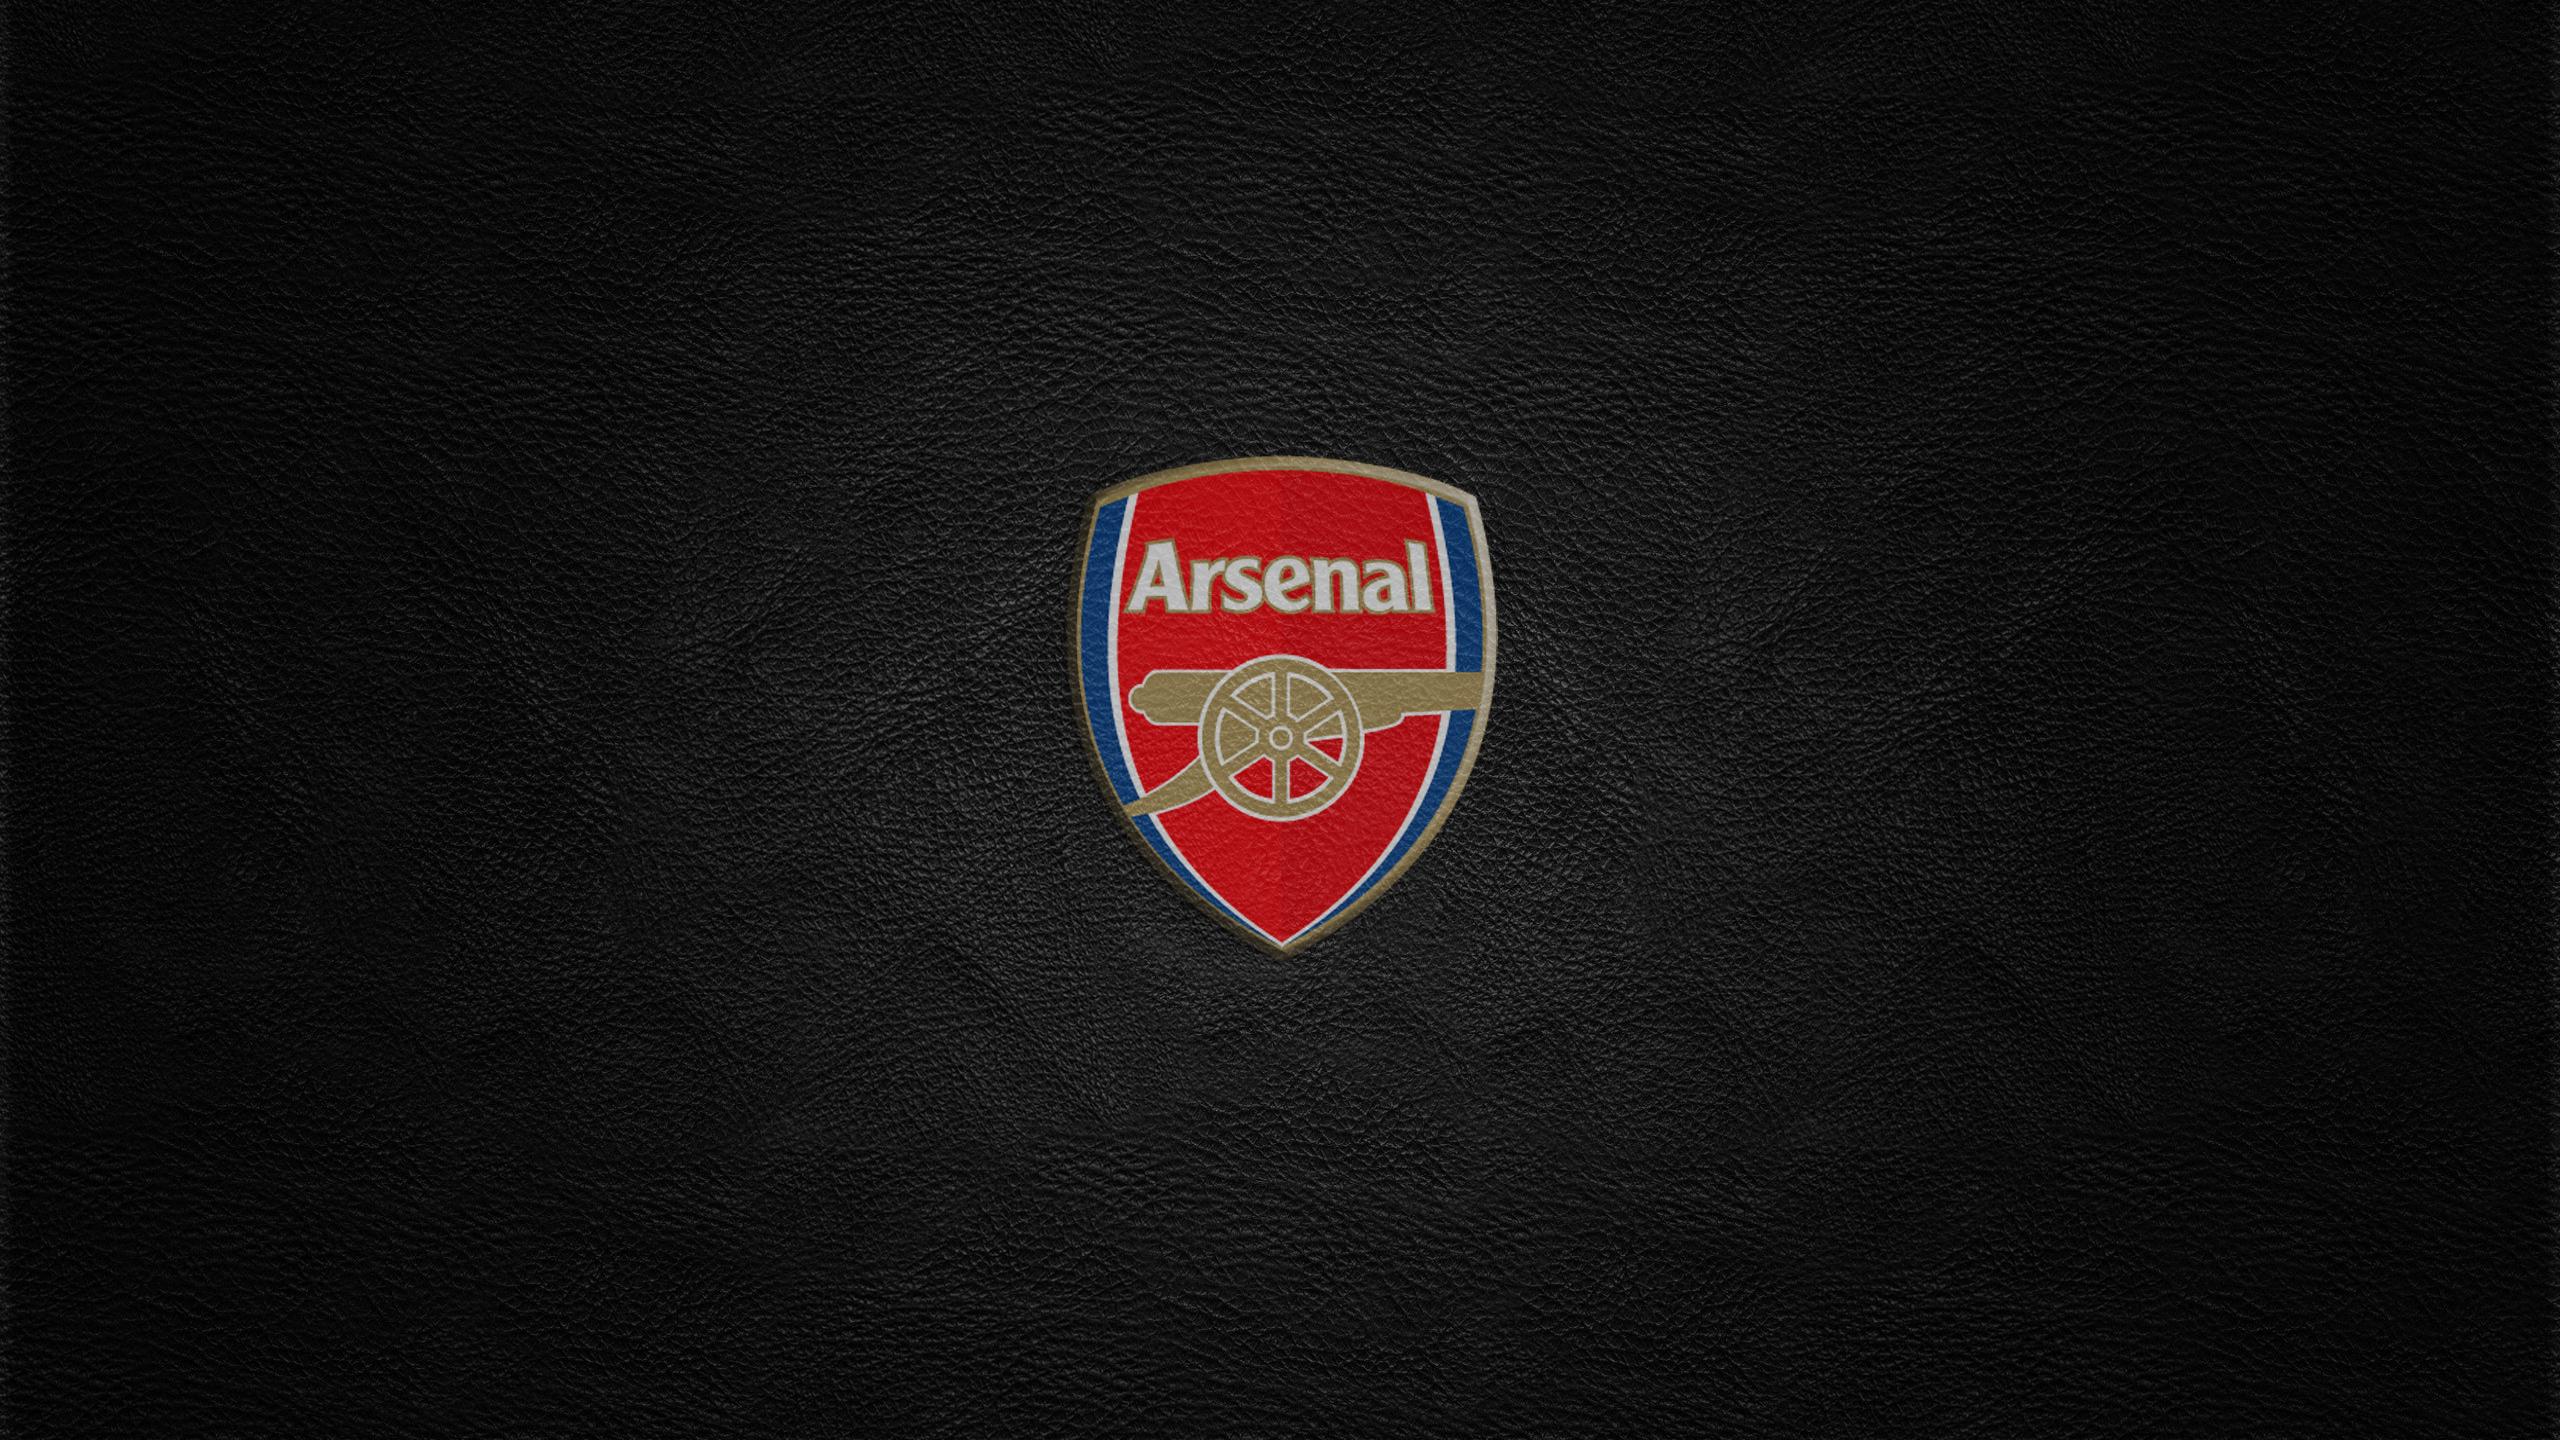 44 Arsenal Wallpaper 1920x1080 On Wallpapersafari